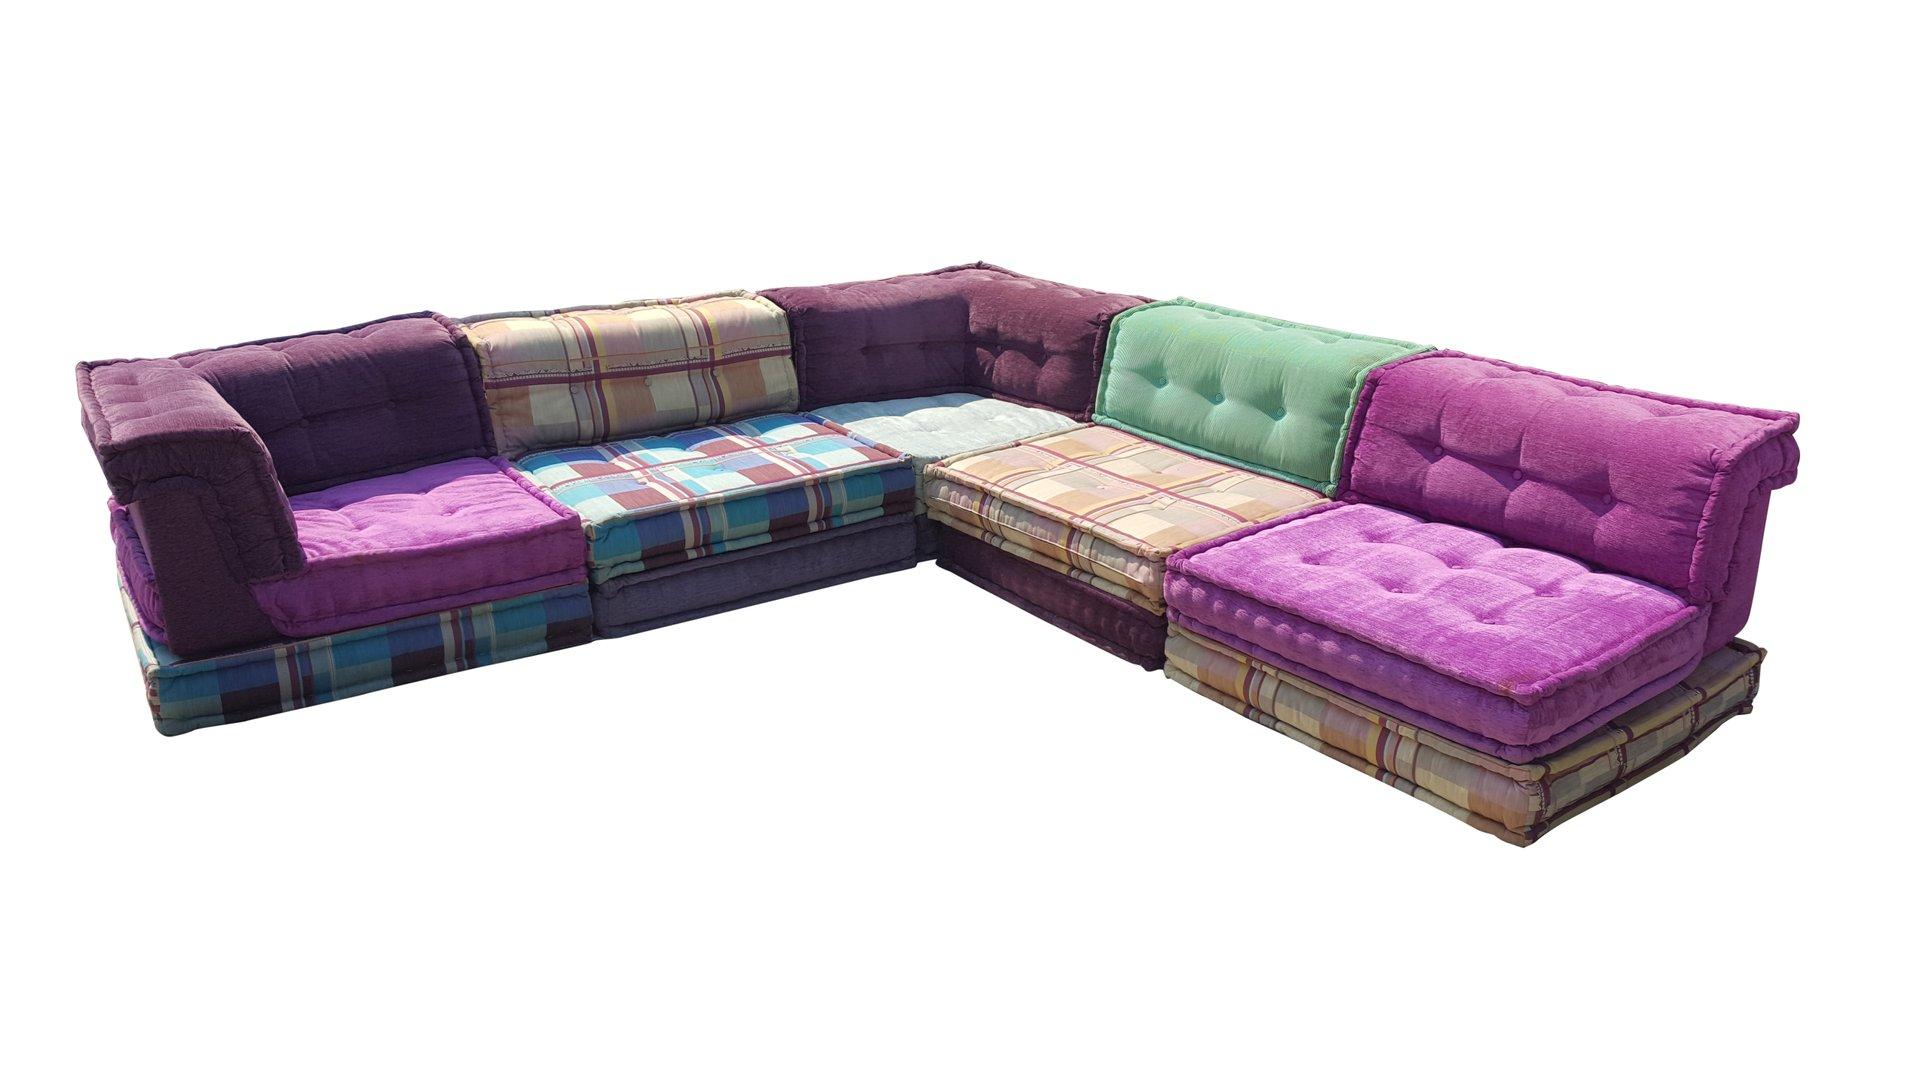 mah jong modular sofa preis natural sofas modulares von hopfer hans für roche bobois ...